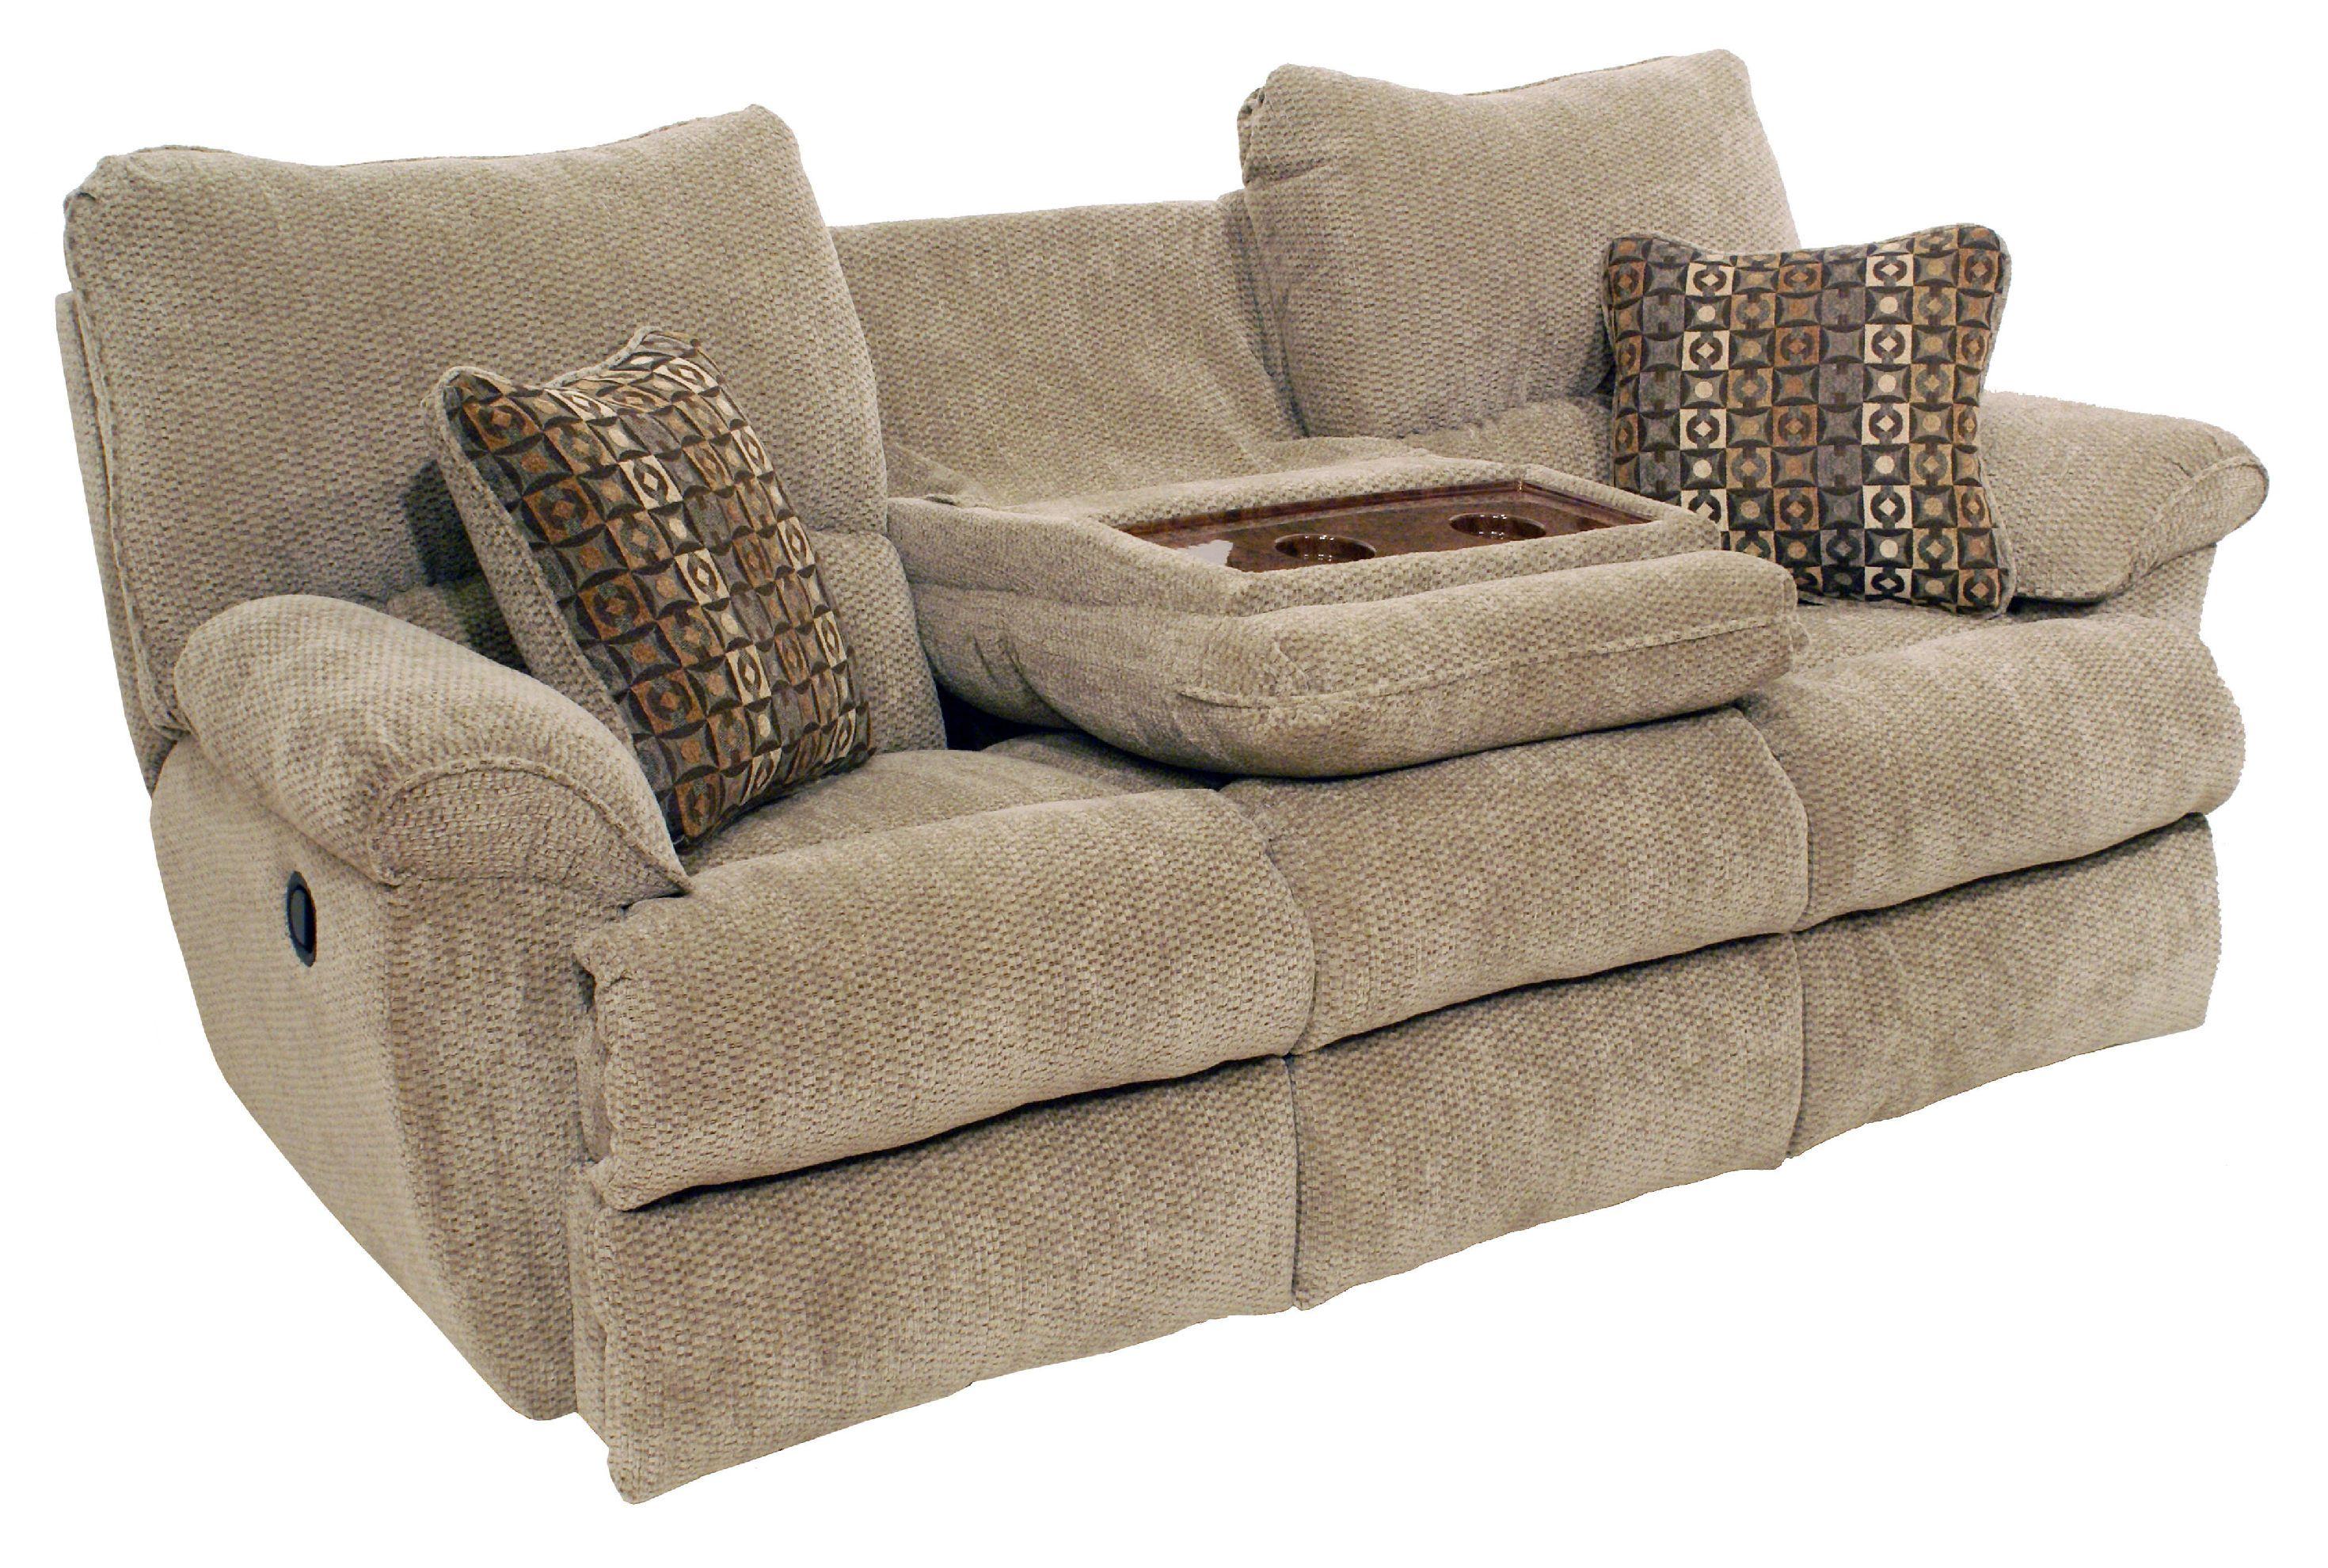 microfiber reclining sofa with drop down table ethan allen bennett sleeper loveseat room